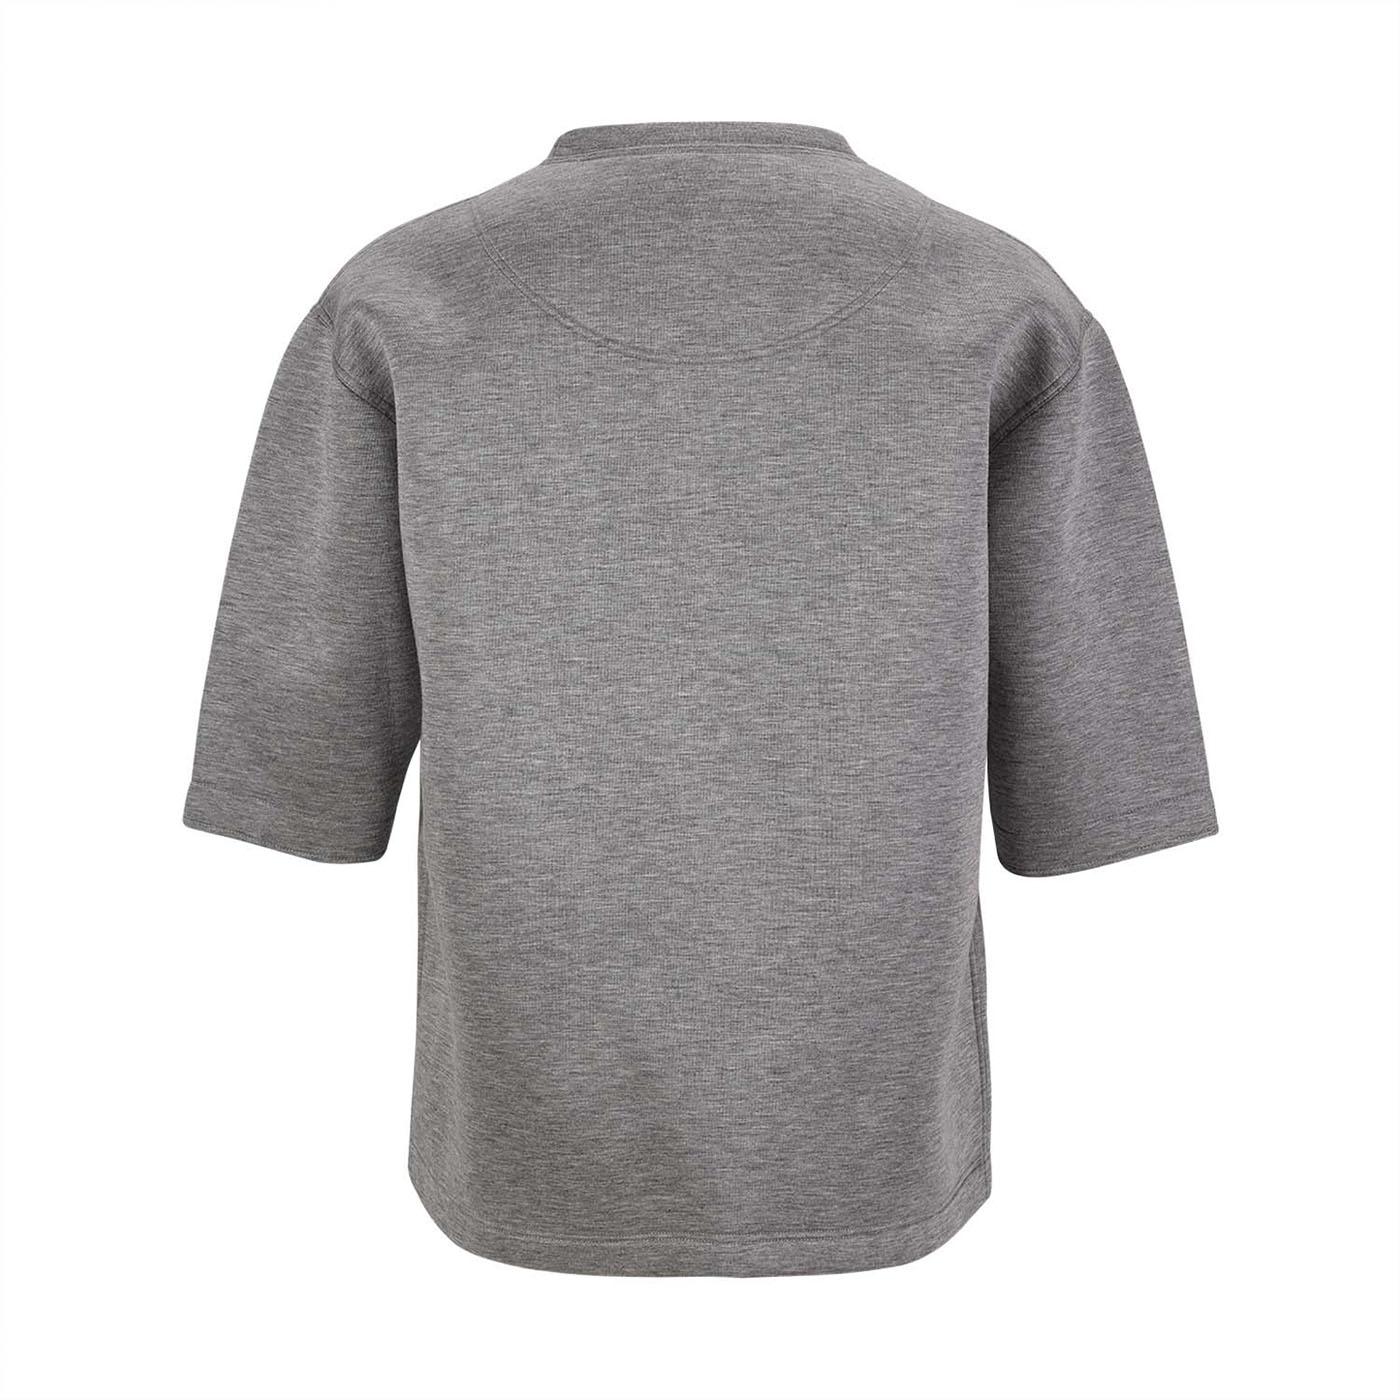 Scuba T-Shirt Estelita Mendonça